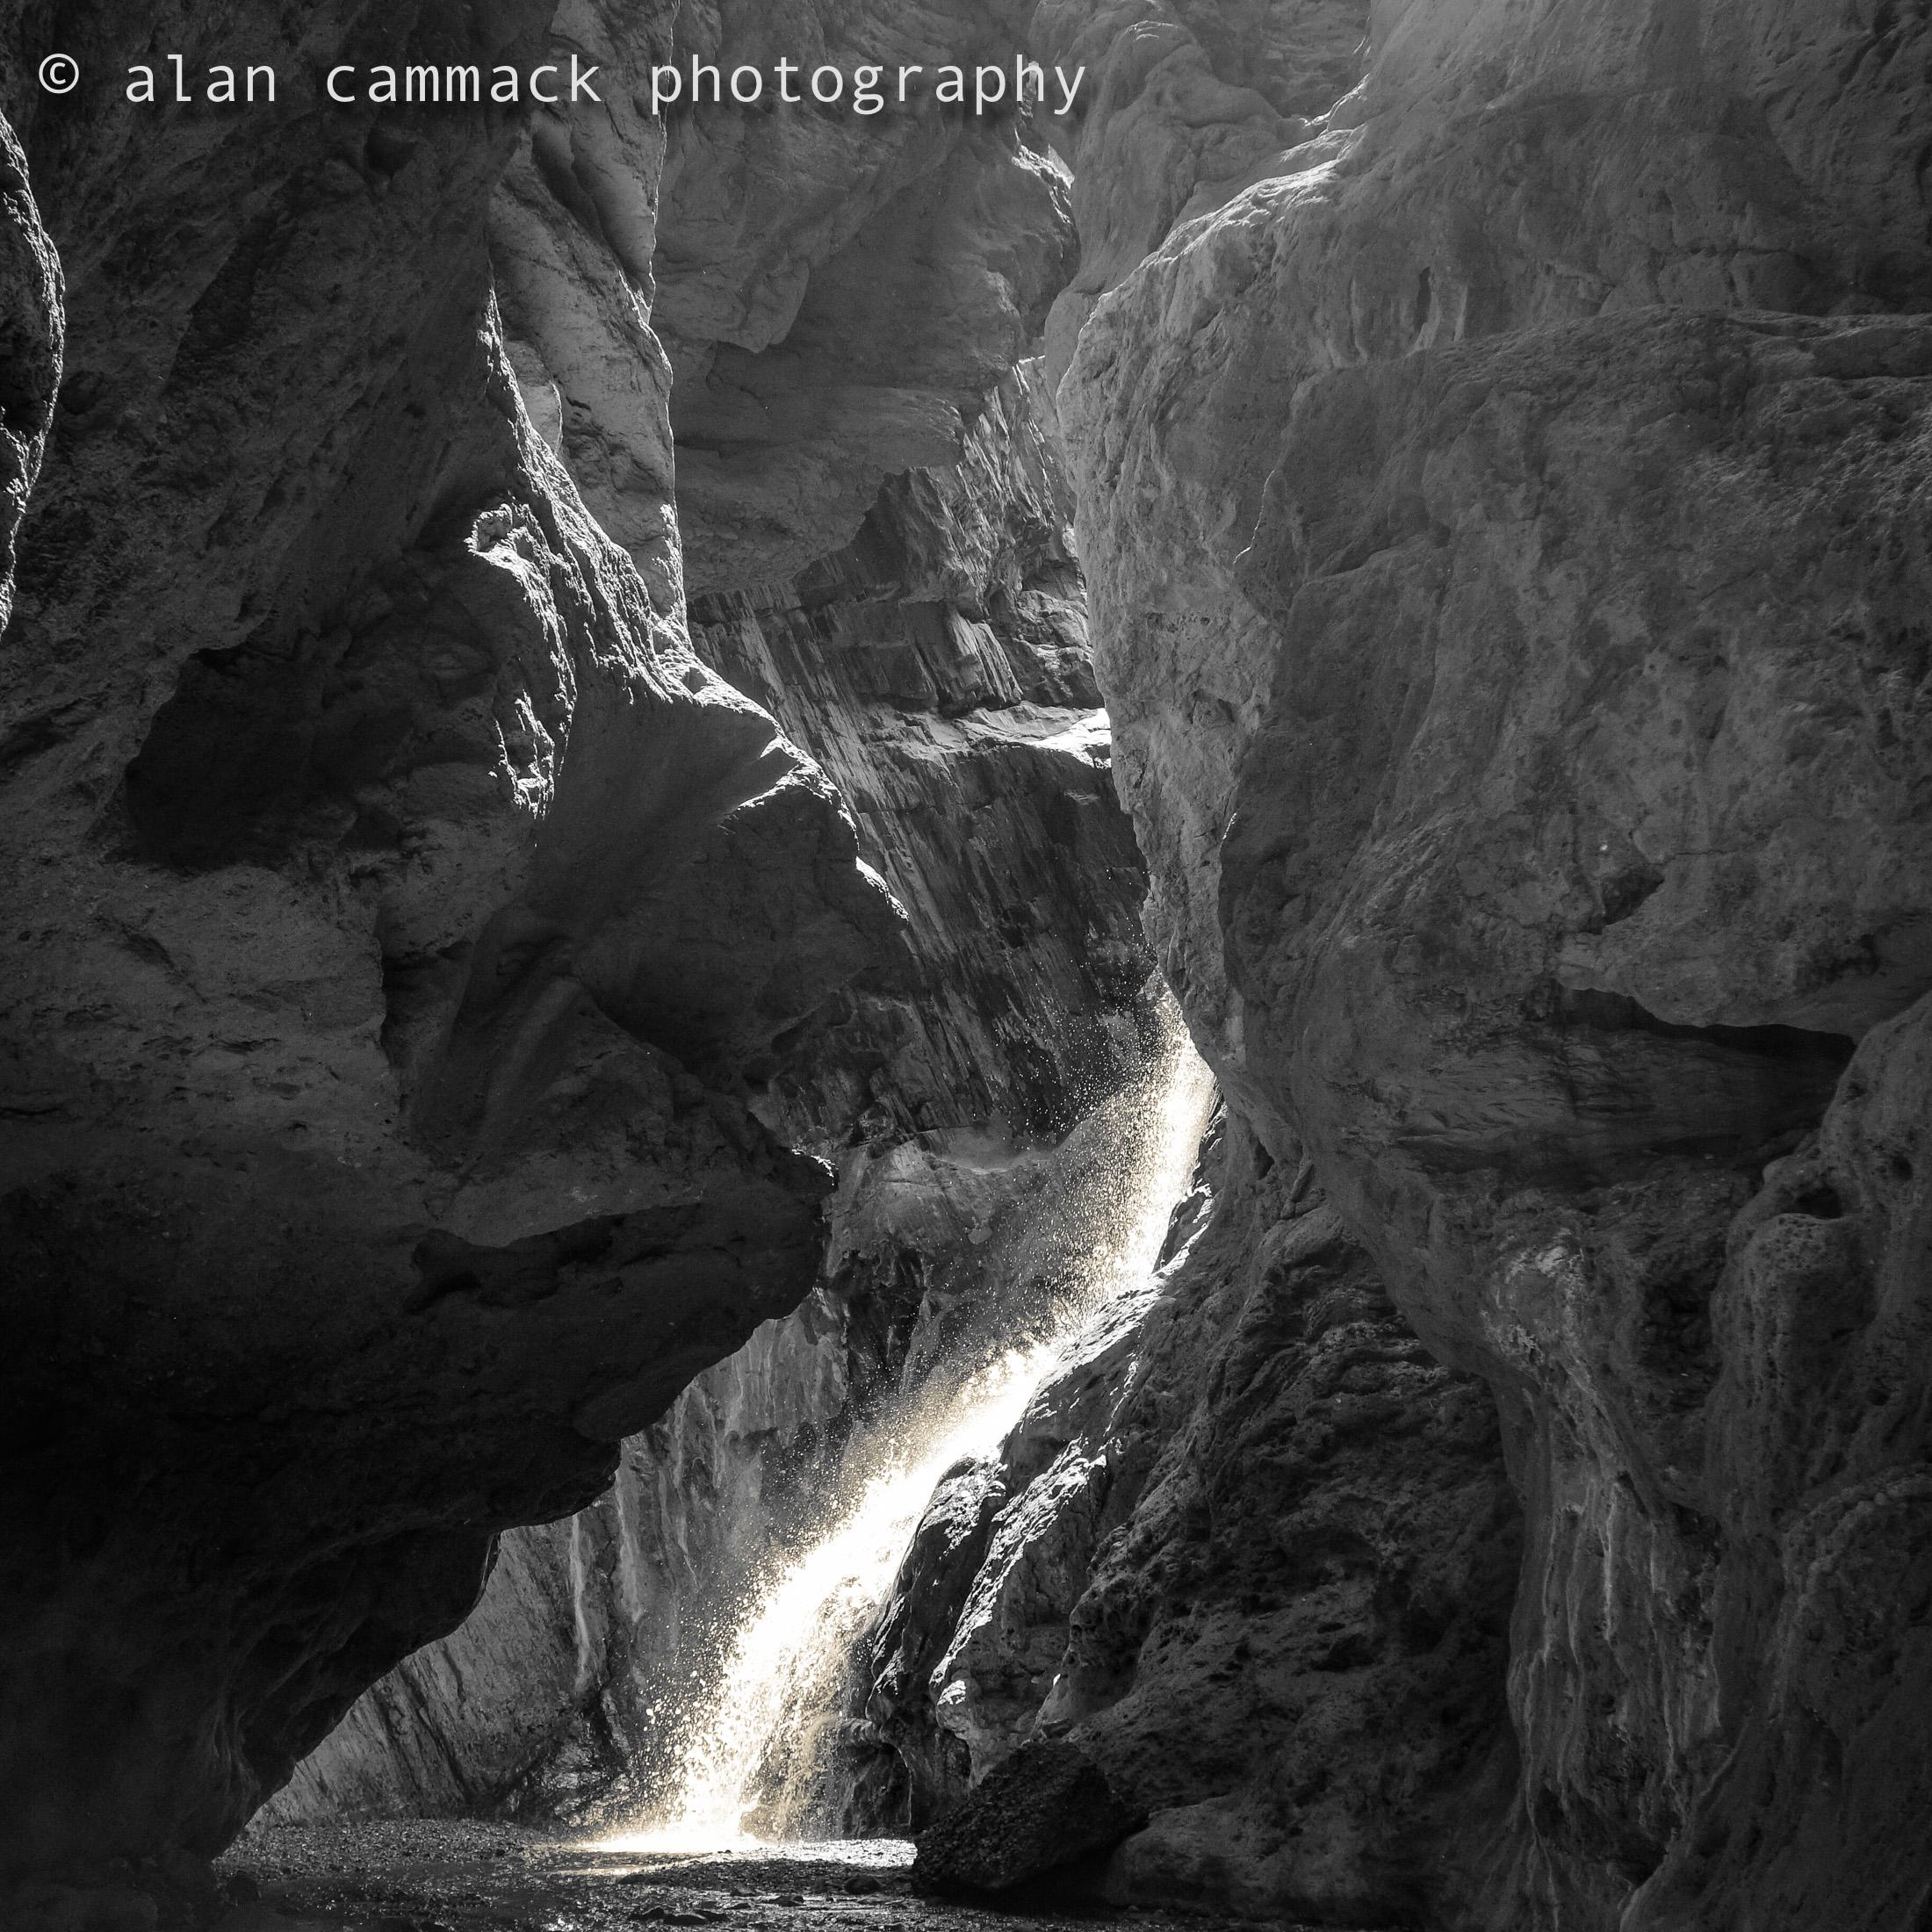 Travertine Falls